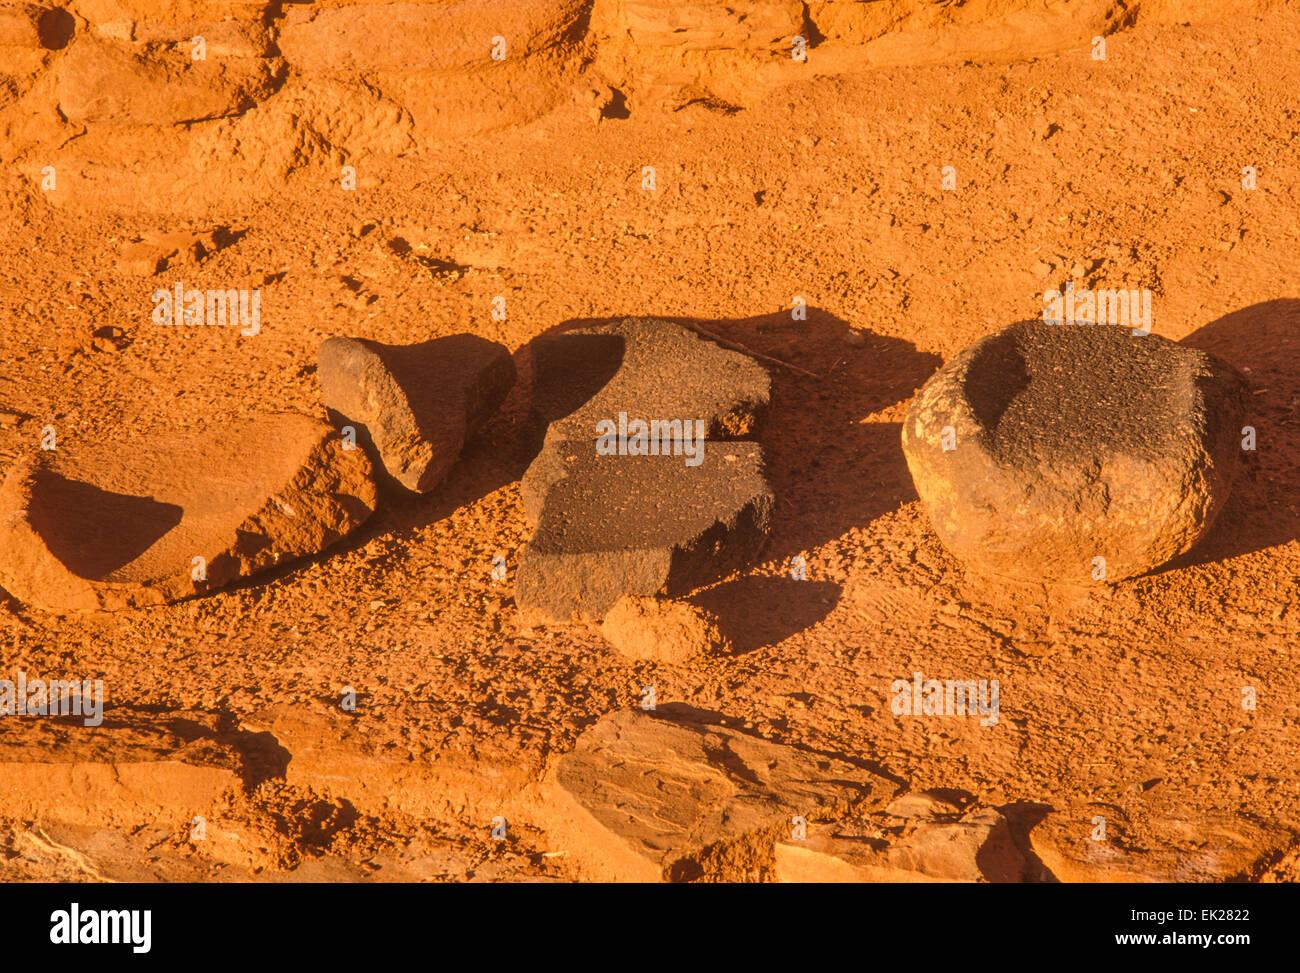 Manos y metates, Wupatki ruinas Anasazi indio, Monumento Nacional Wupatki, Arizona Imagen De Stock